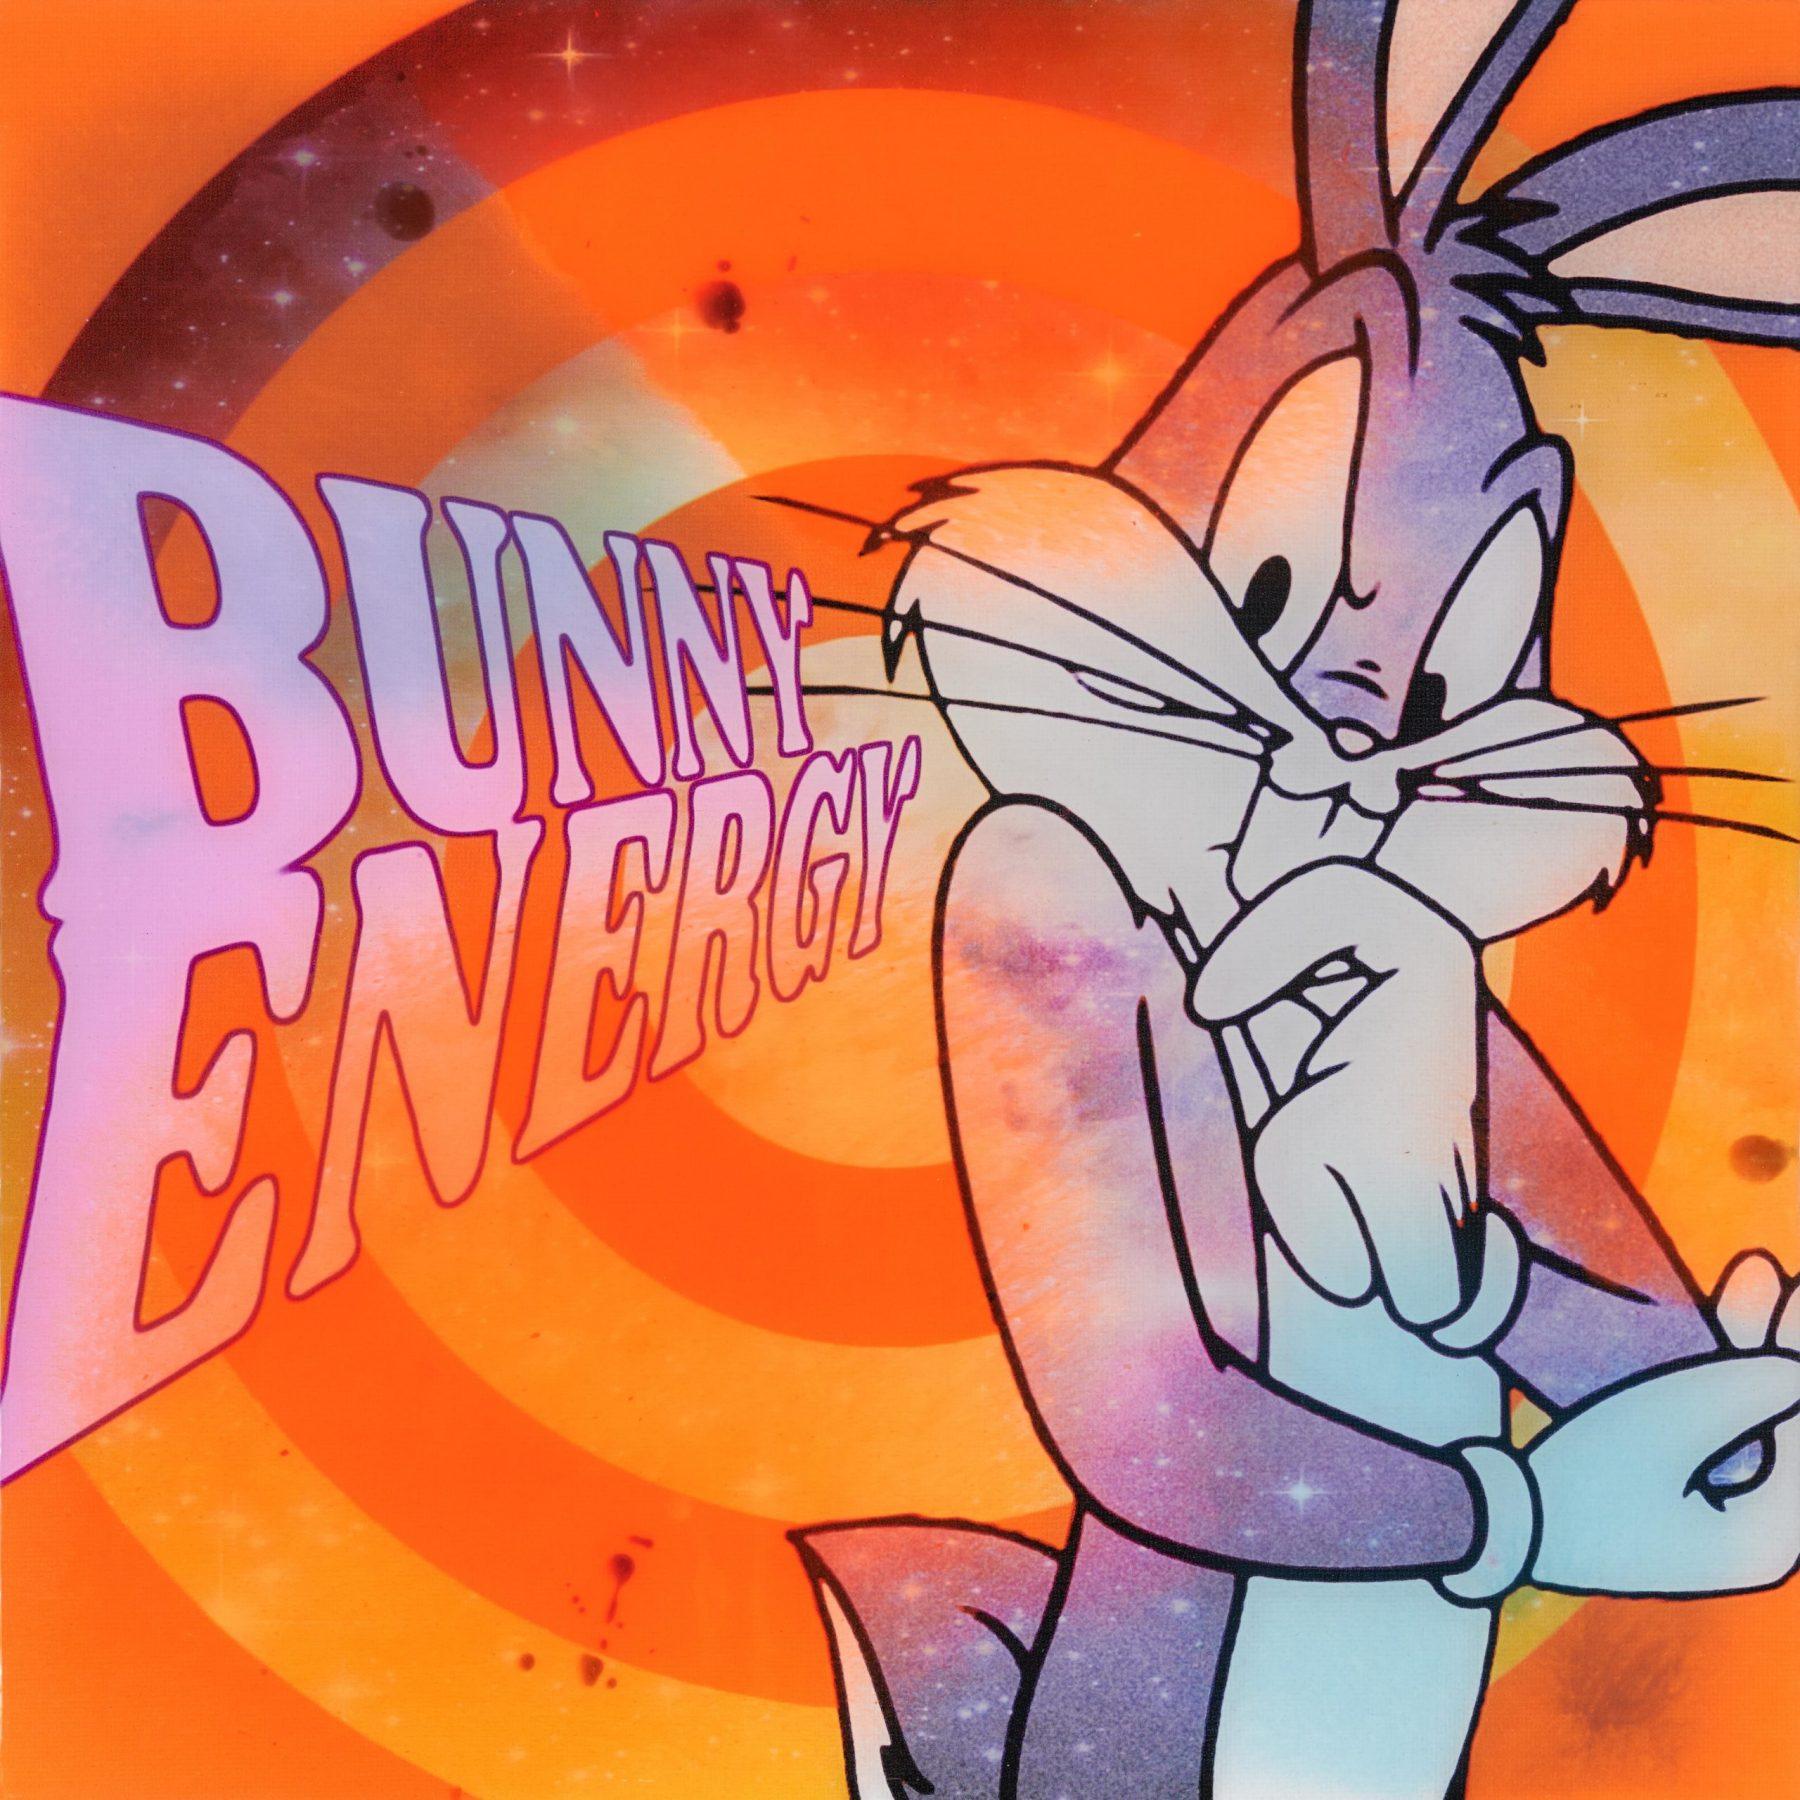 Bunny Energy - Döring, Jörg - k-DBUEN14